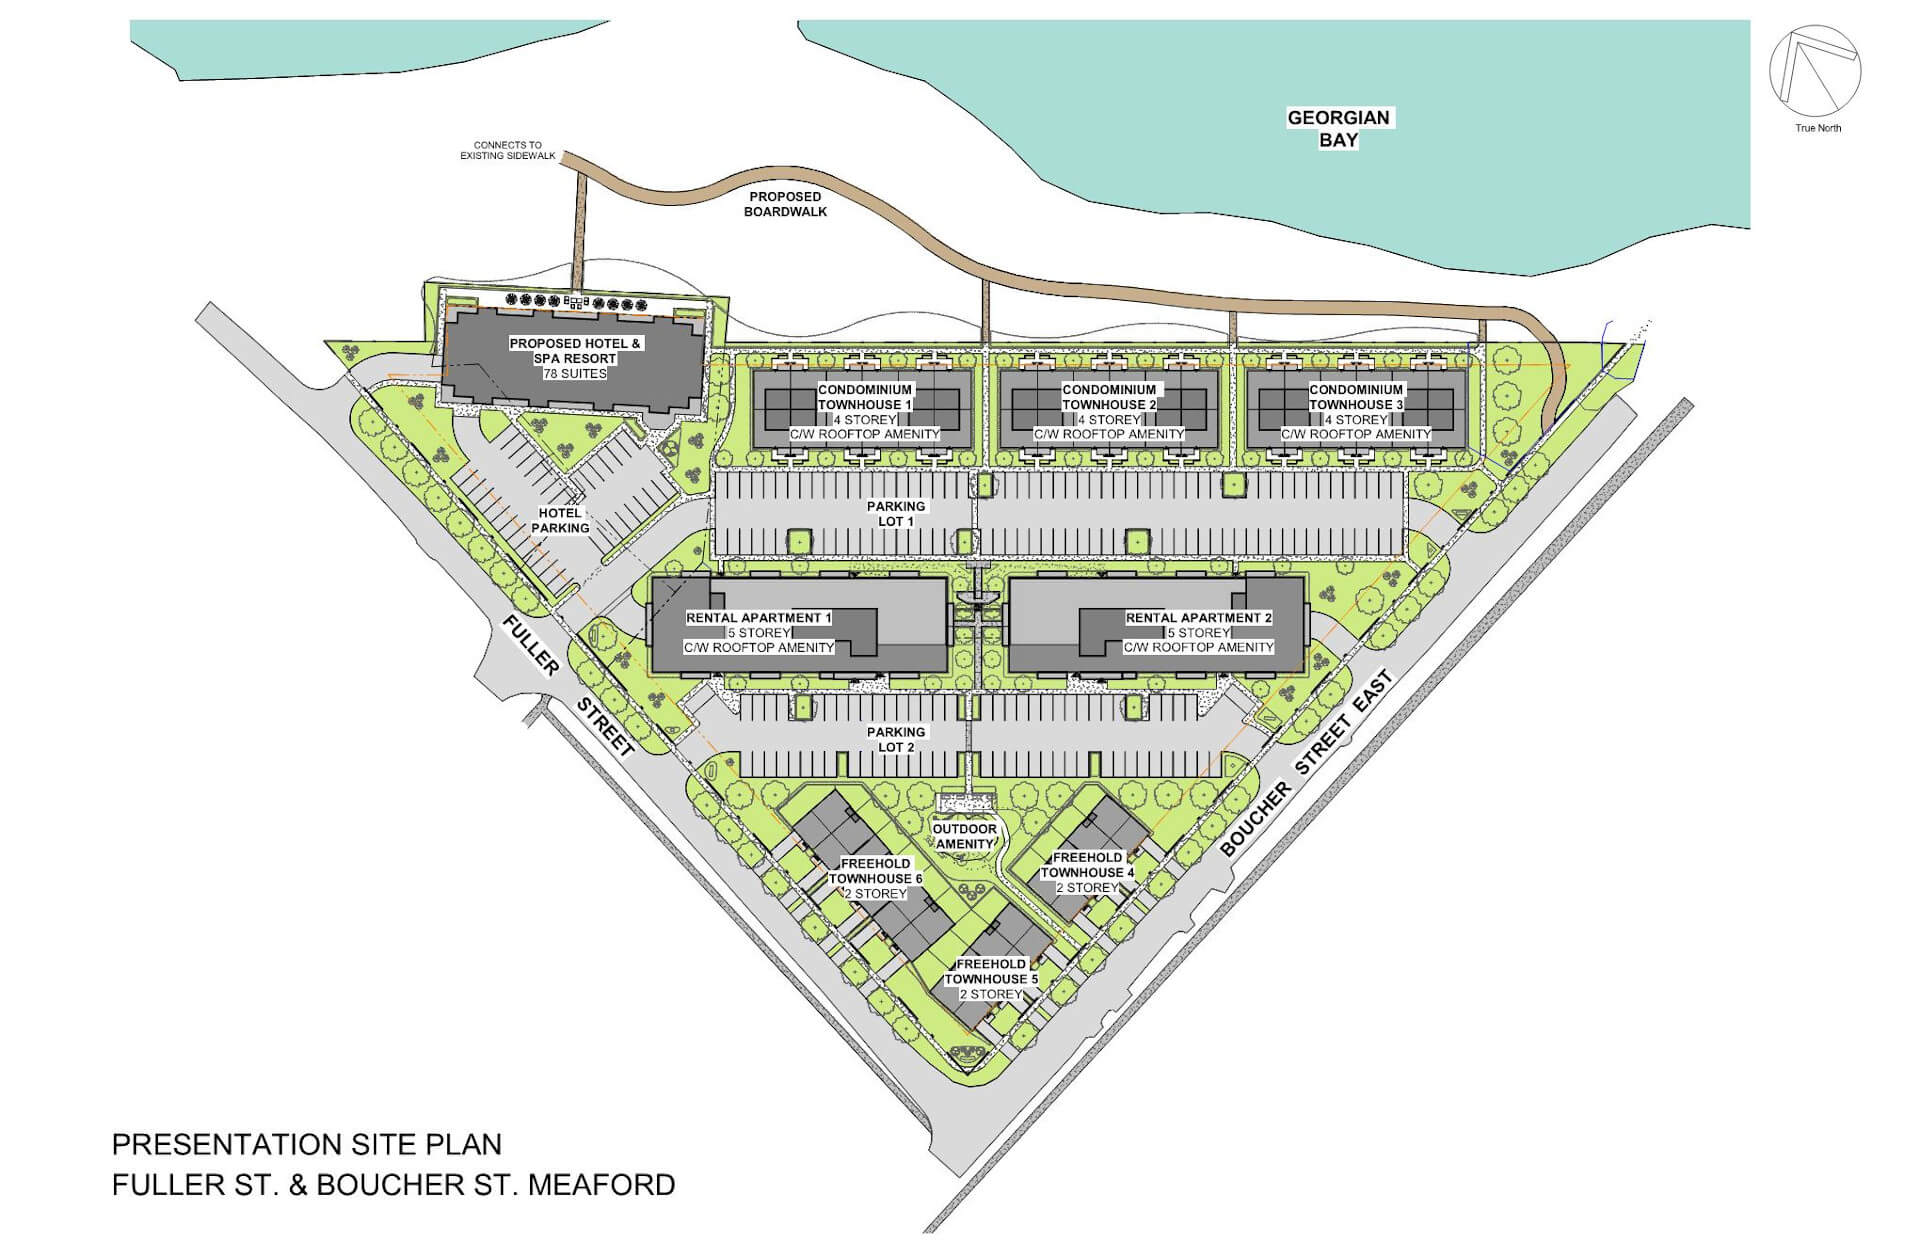 Presentation Site Plan, Fuller St. & Boucher St. Meaford